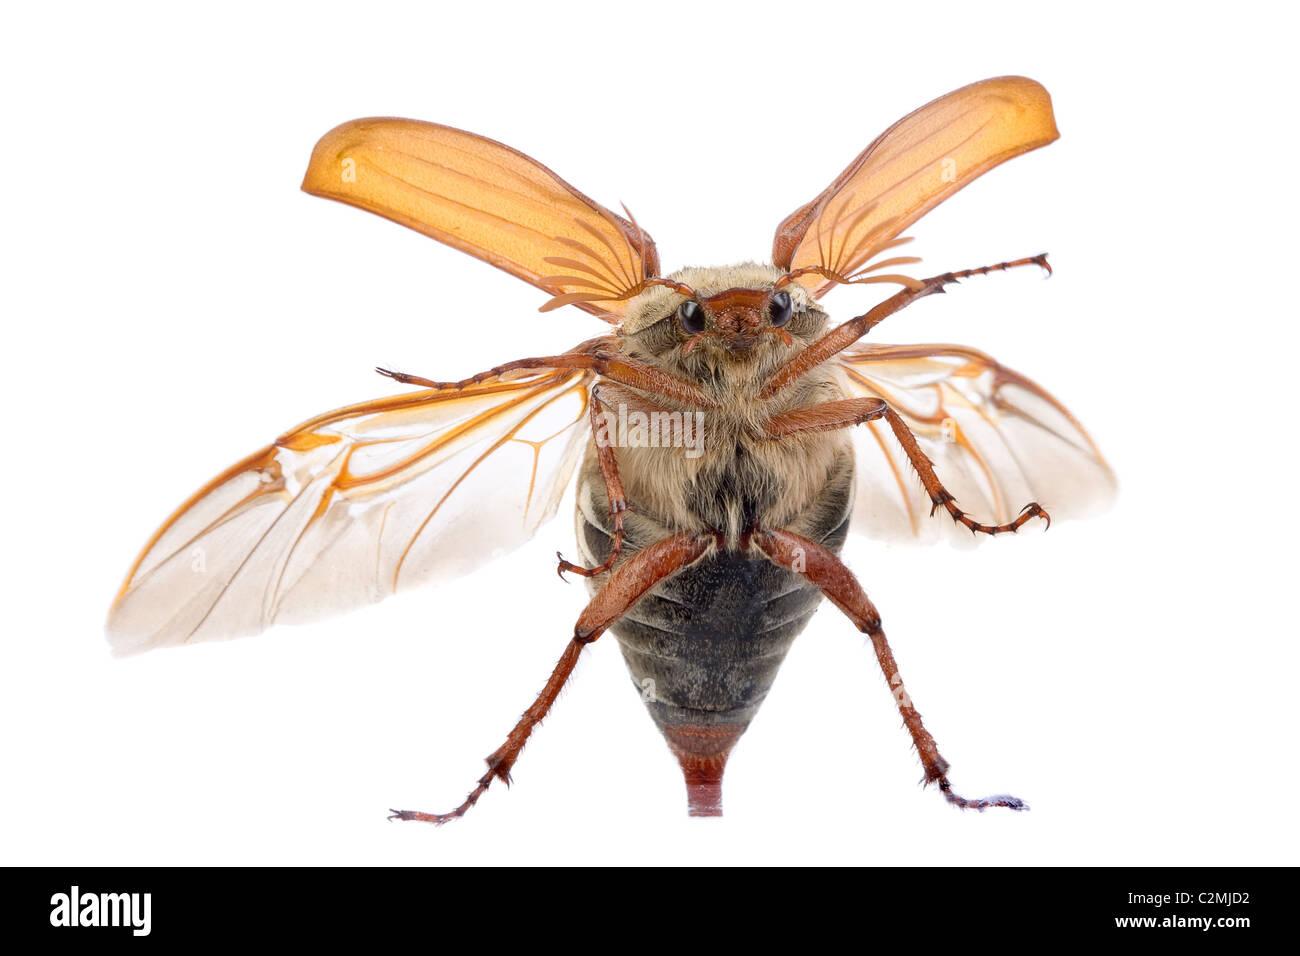 Maybug beetle flying up against a glass window Stock Photo